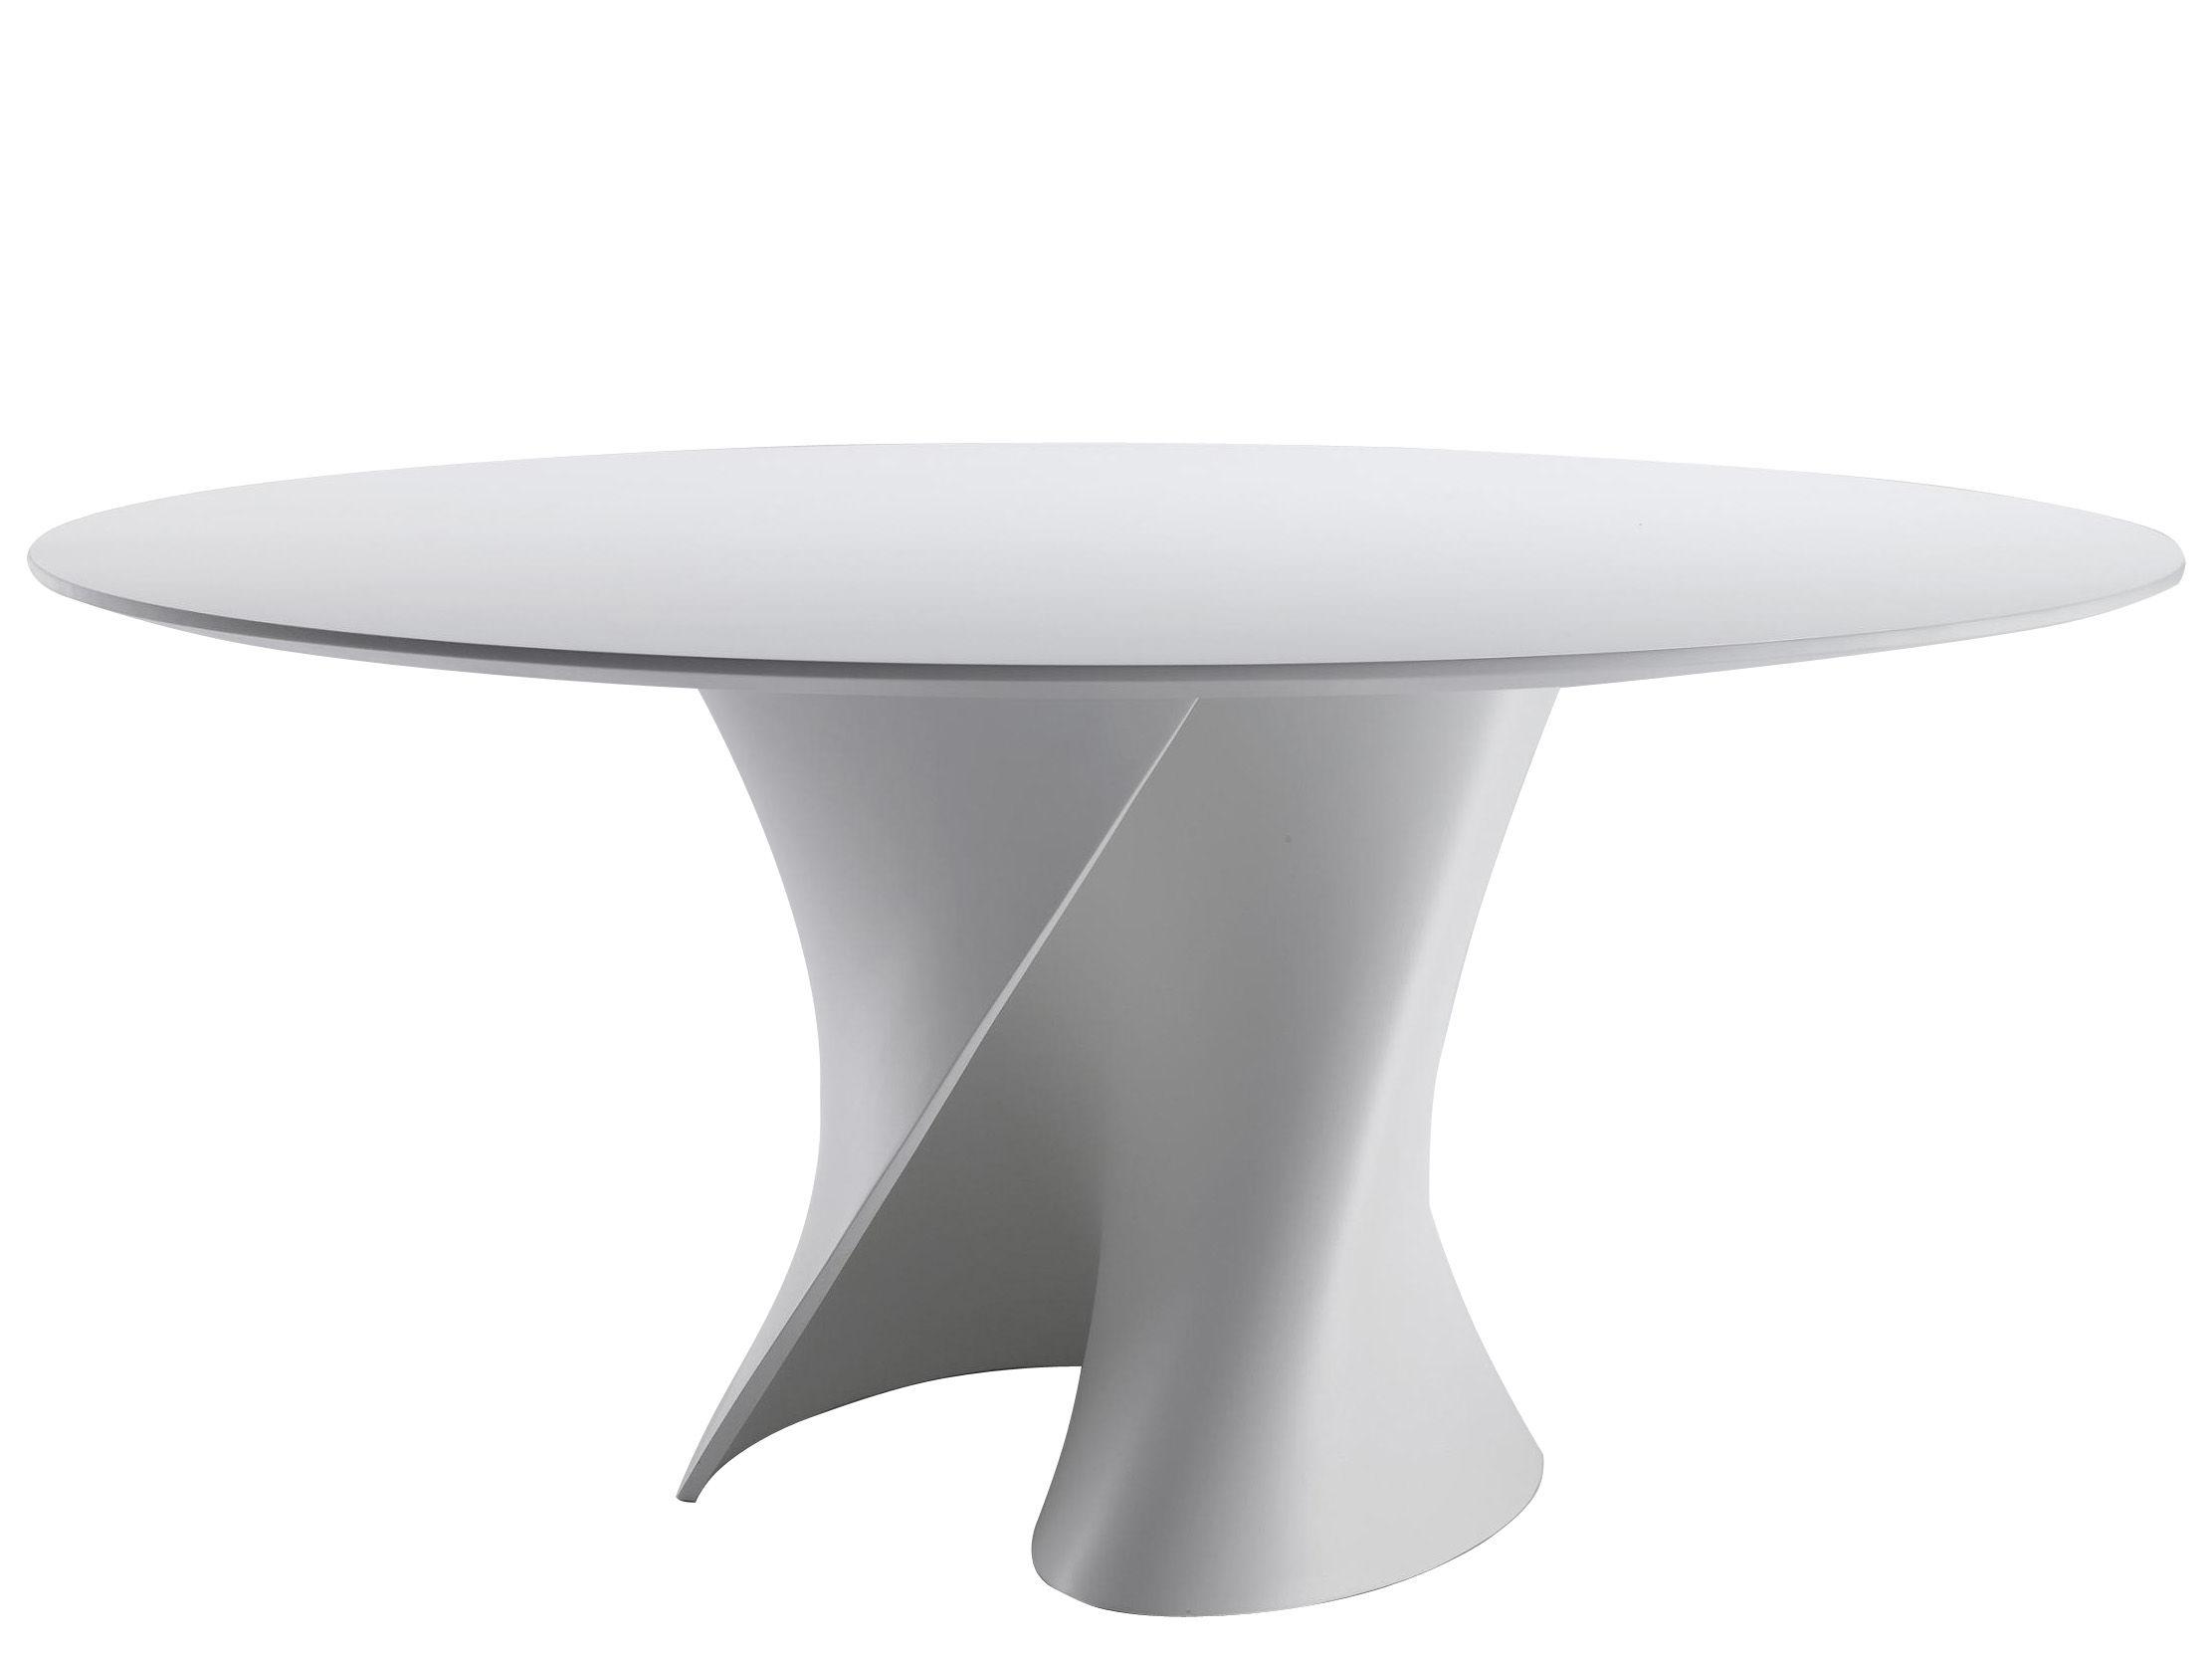 Tendances - Espace Repas - Table S / Ø 140 cm - Plateau Cristalplant - MDF Italia - Blanc - Cristalplant